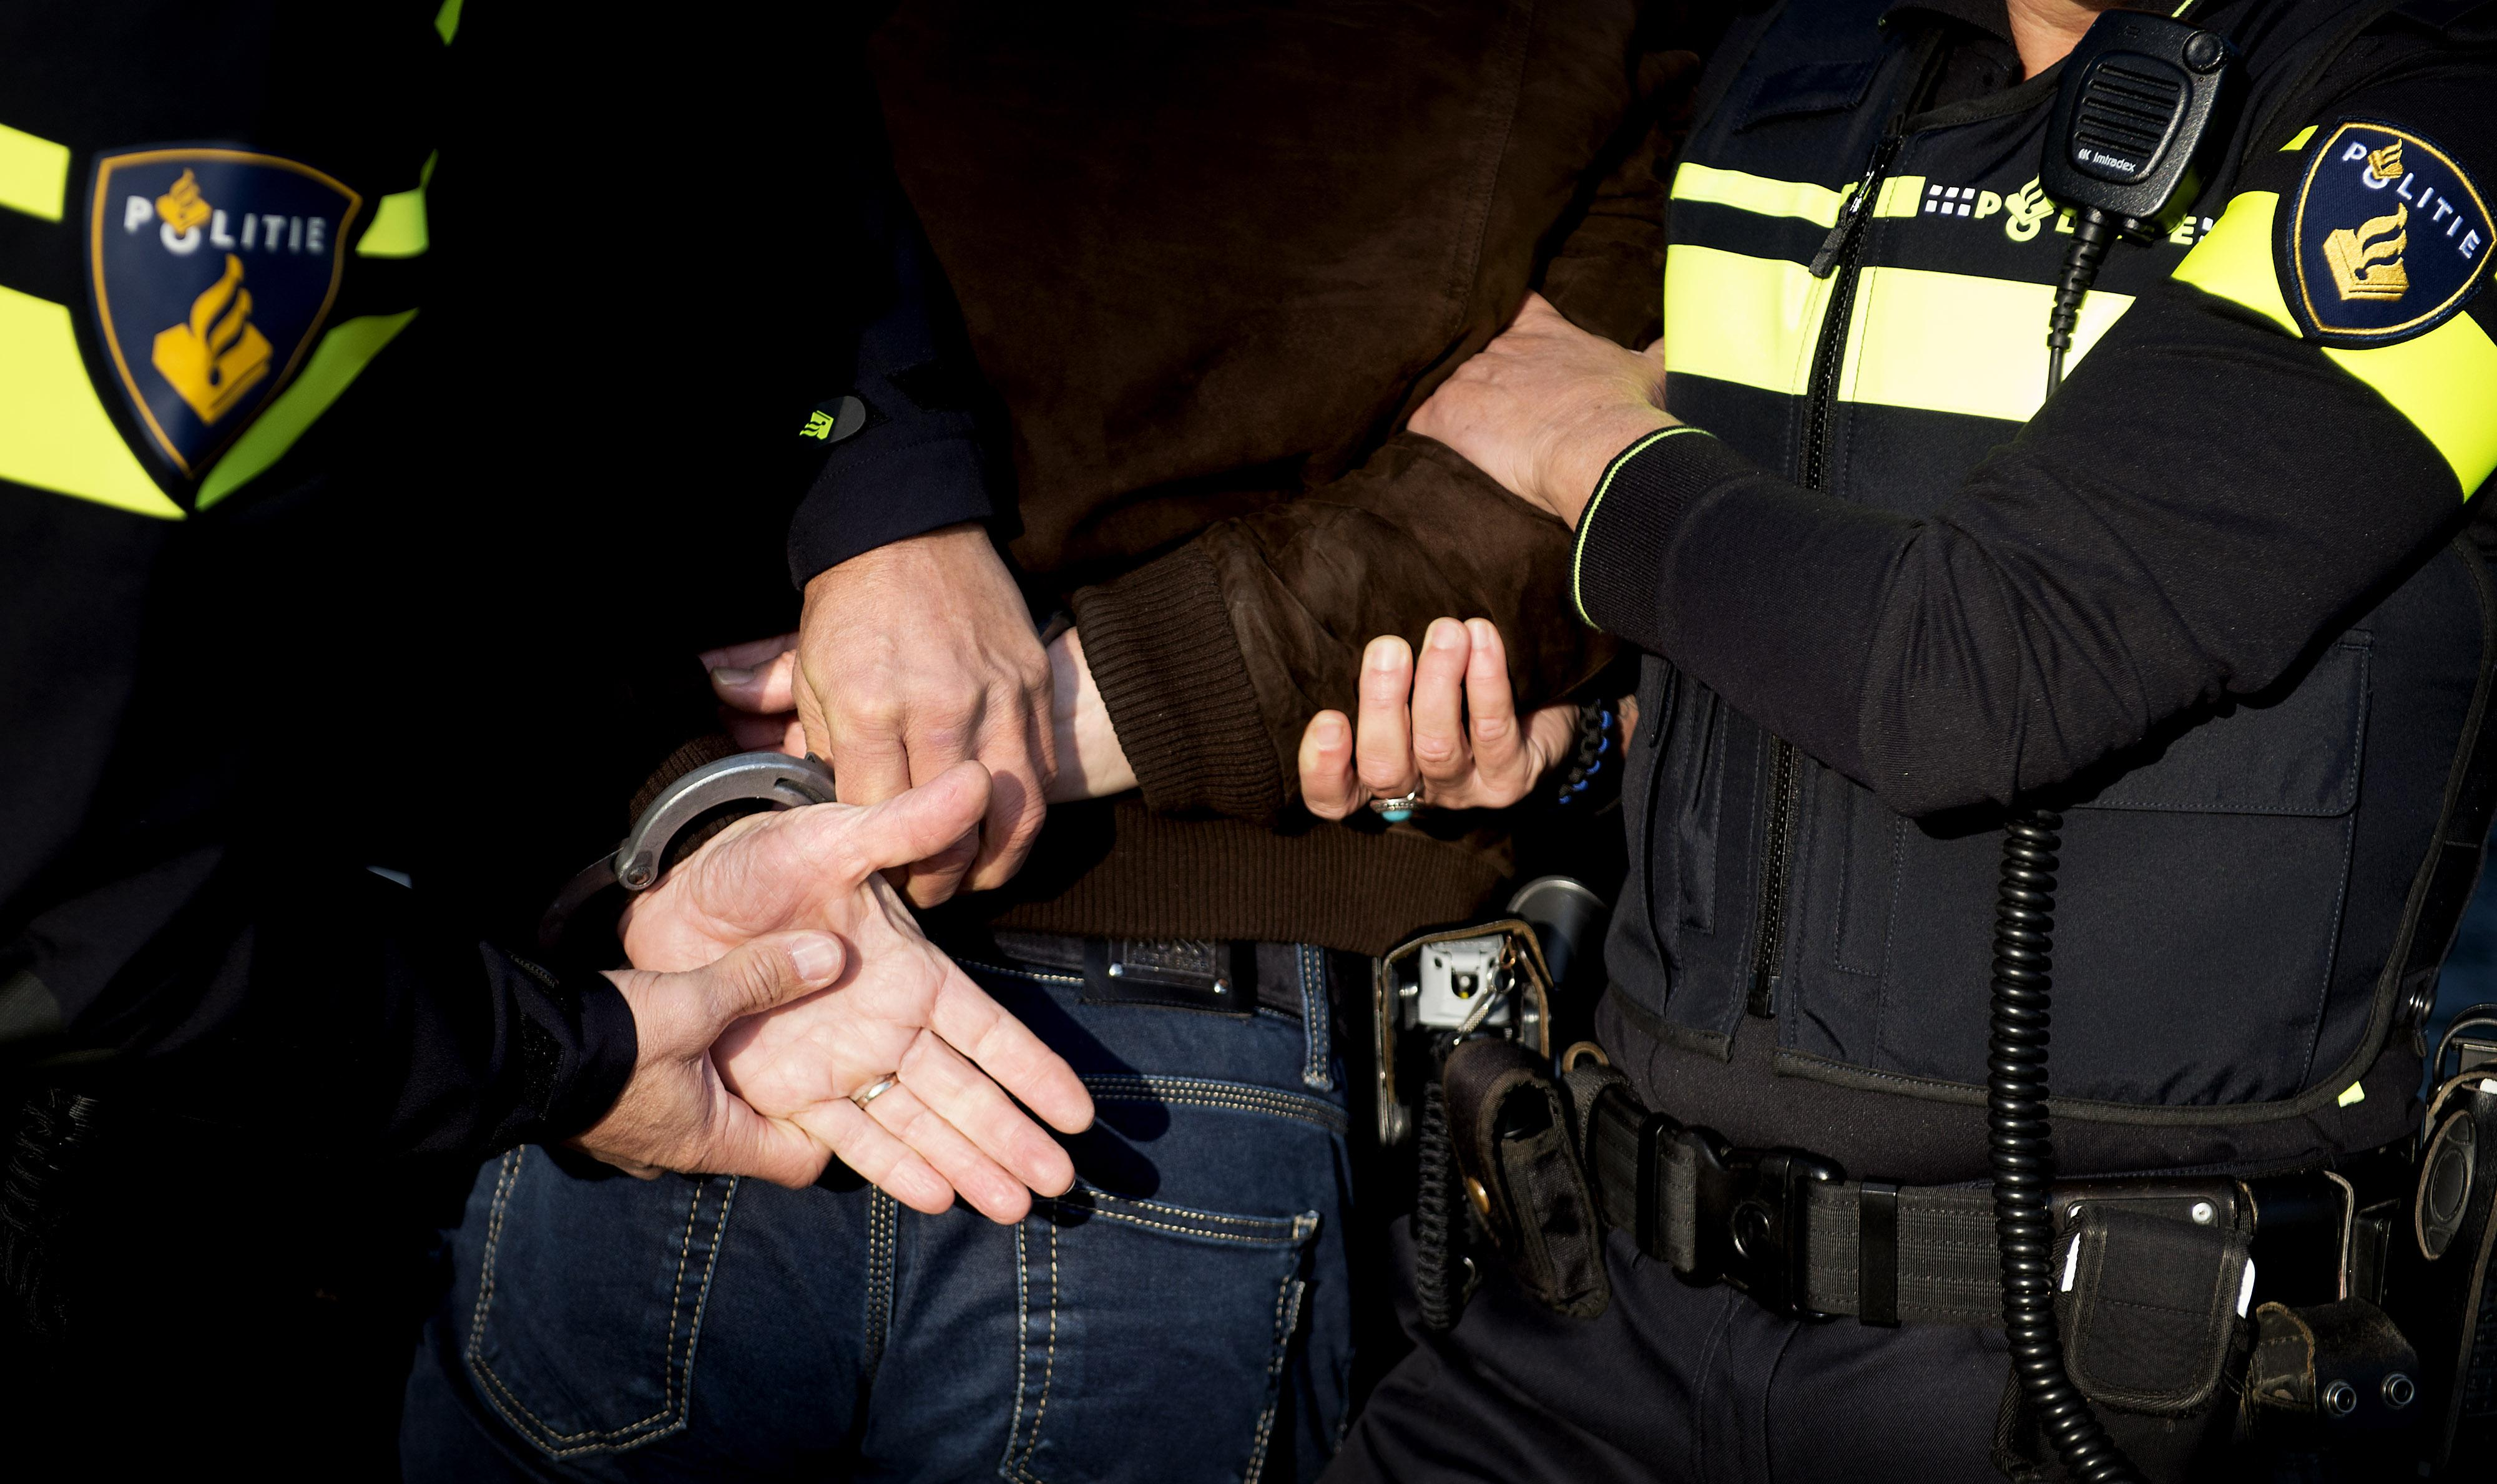 Drie 16-jarigen stelen SUV in Hoorn, politie rijdt ze klem in Amsterdam